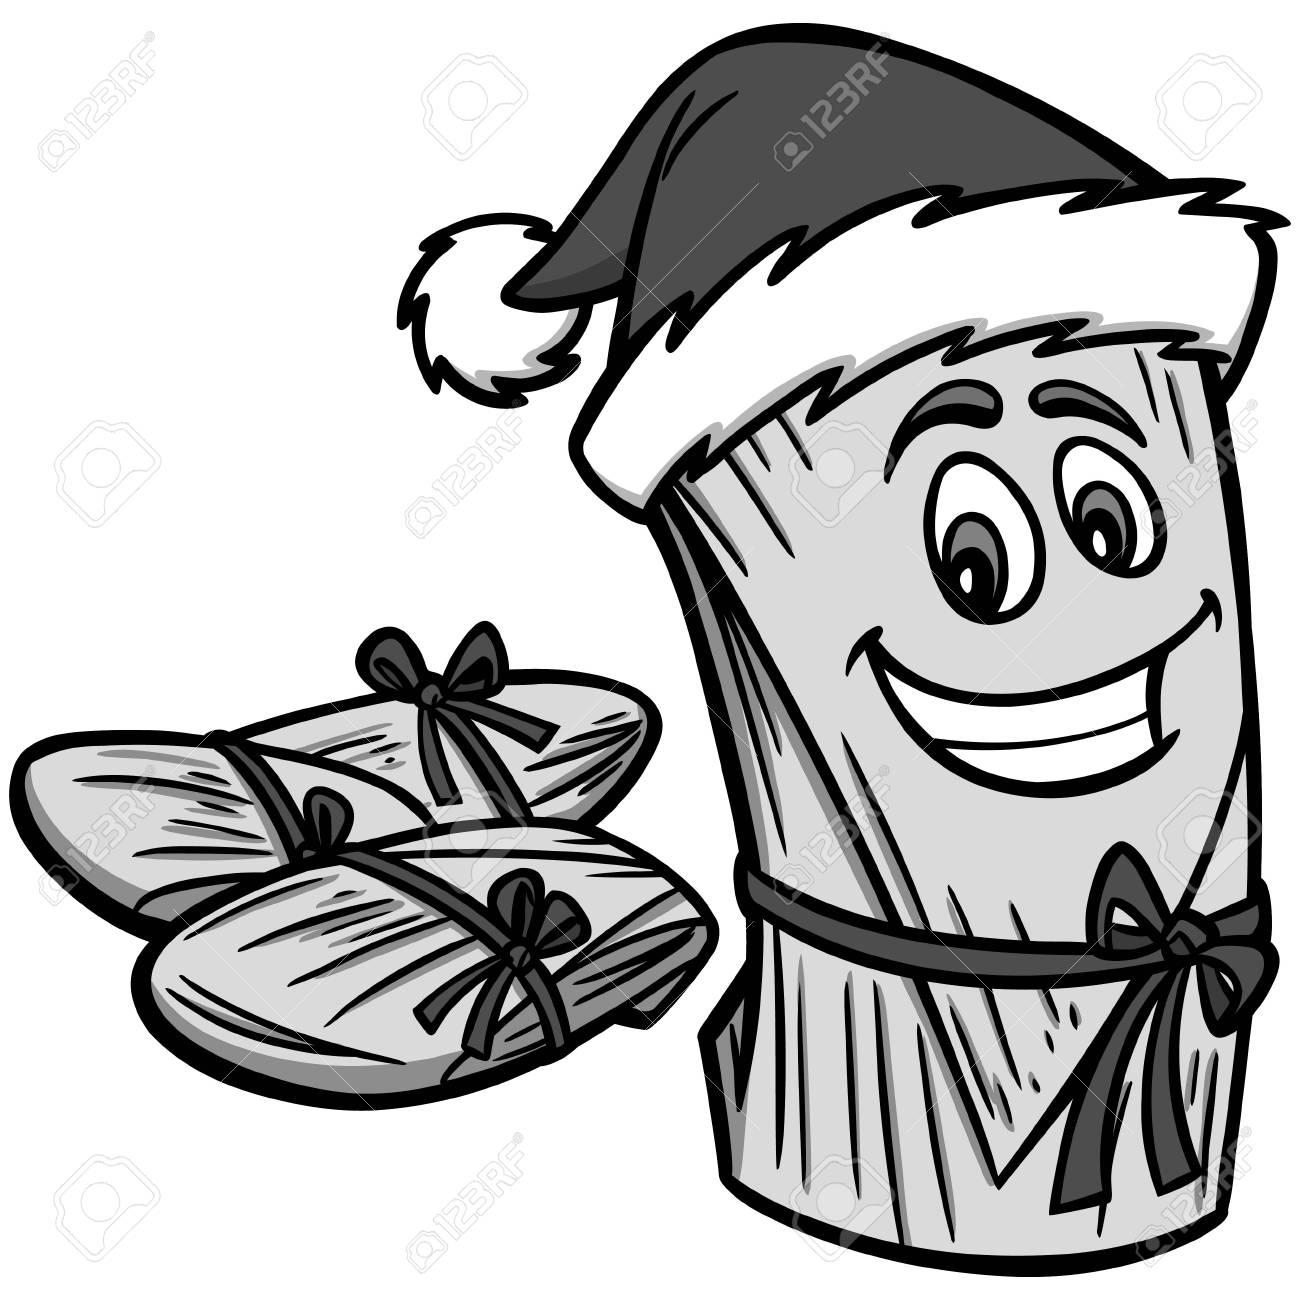 Christmas Hat Cartoon.Christmas Tamales Illustration A Vector Cartoon Illustration